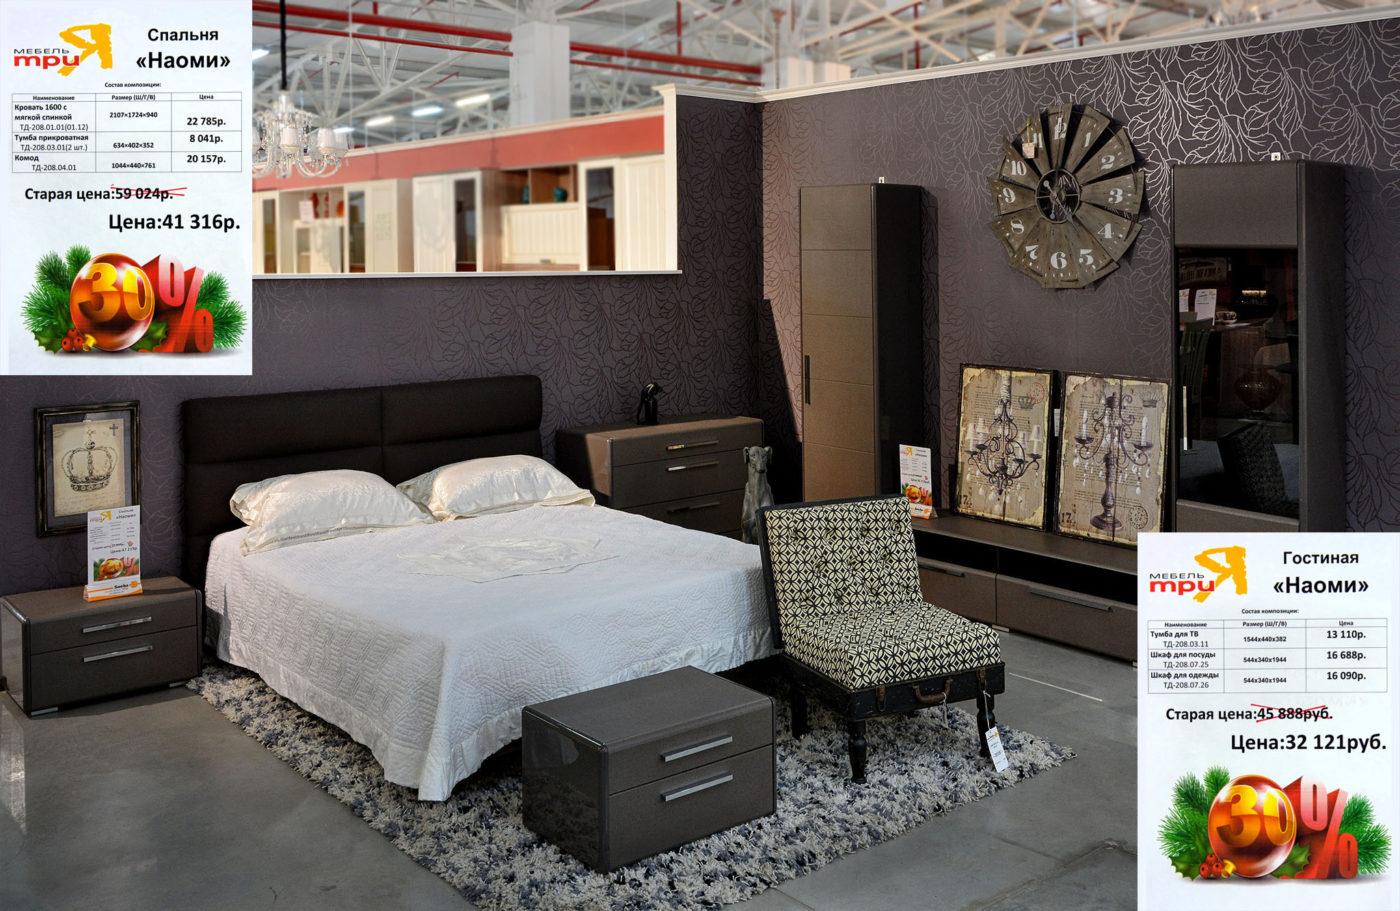 DSC_0786-Три я, мебель, спальня, гостиная, Наоми.